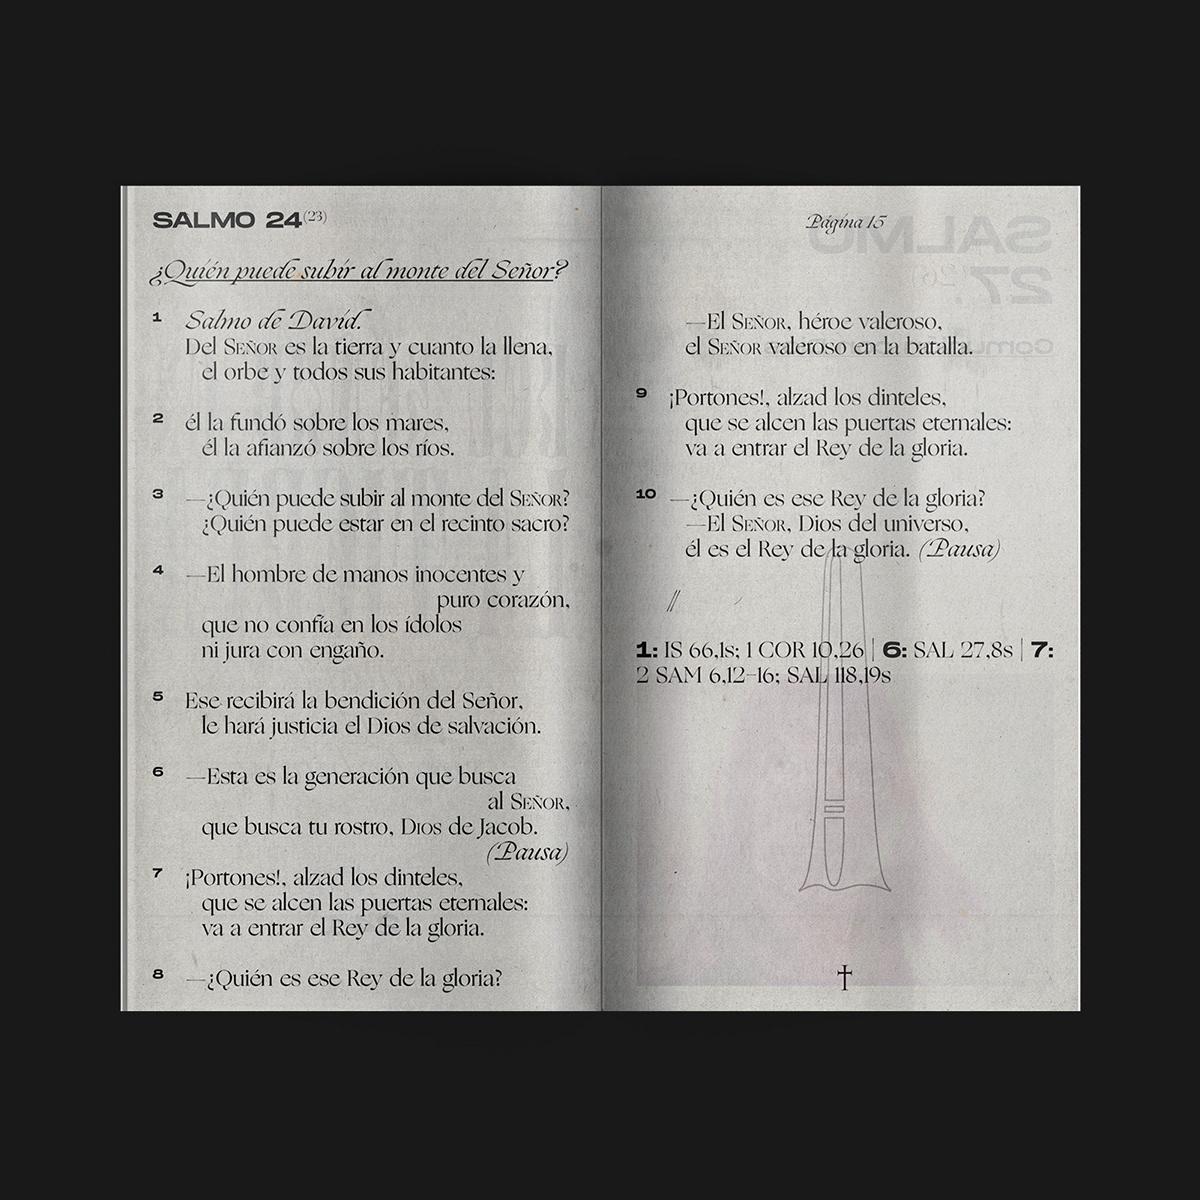 salmos,Psalms,religious,david,bible,Biblia,ogg,digestive,misa,Christian